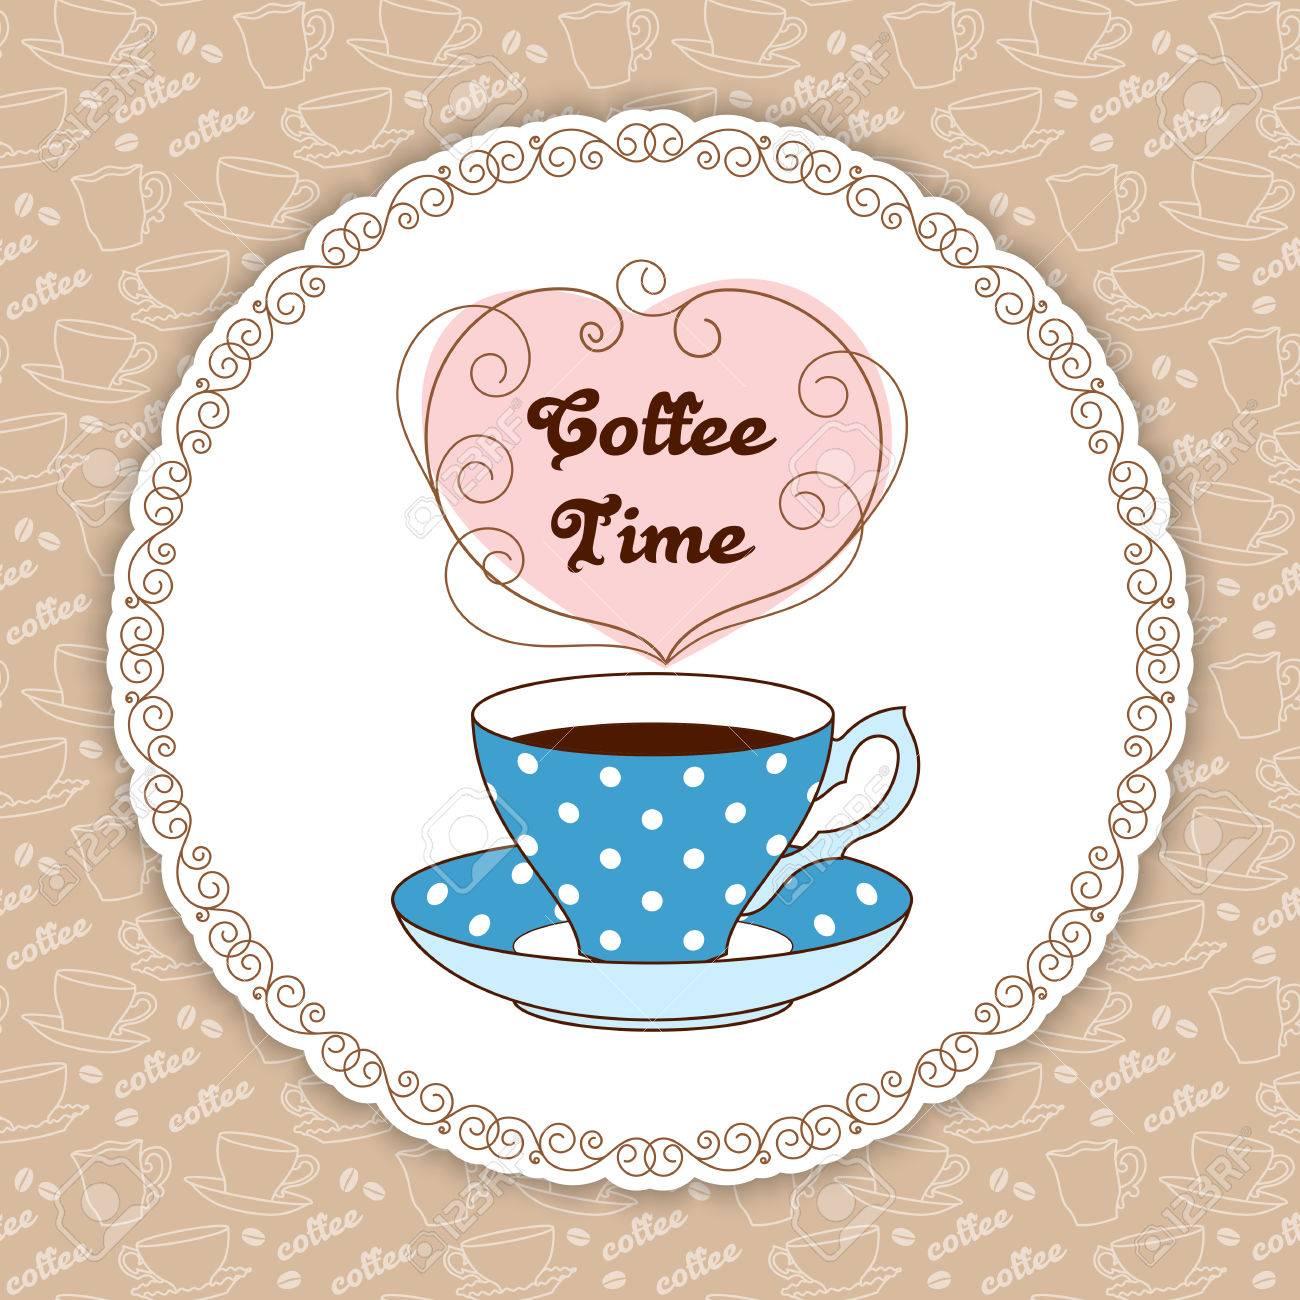 Ilustración De Polka Dot Lindo Taza De Té Con Café O Té. La Hora Del ...